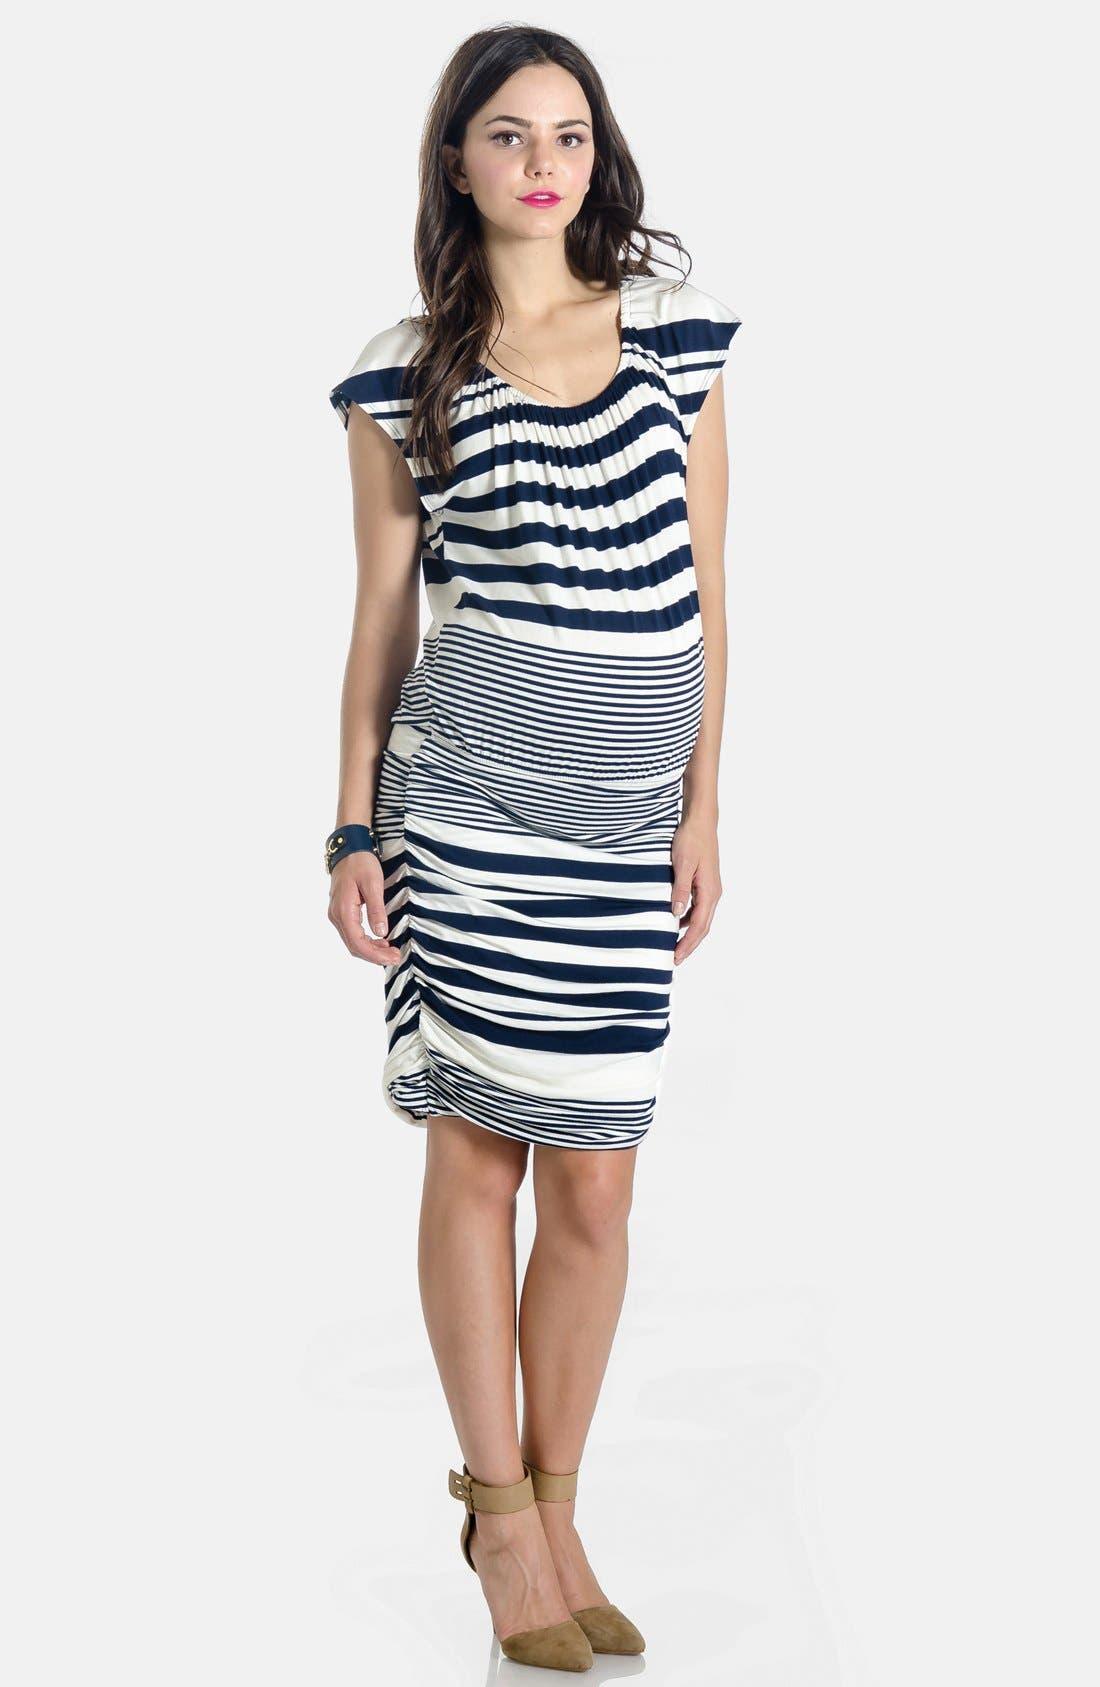 LILAC CLOTHING 'Mila' Maternity Dress, Main, color, 410